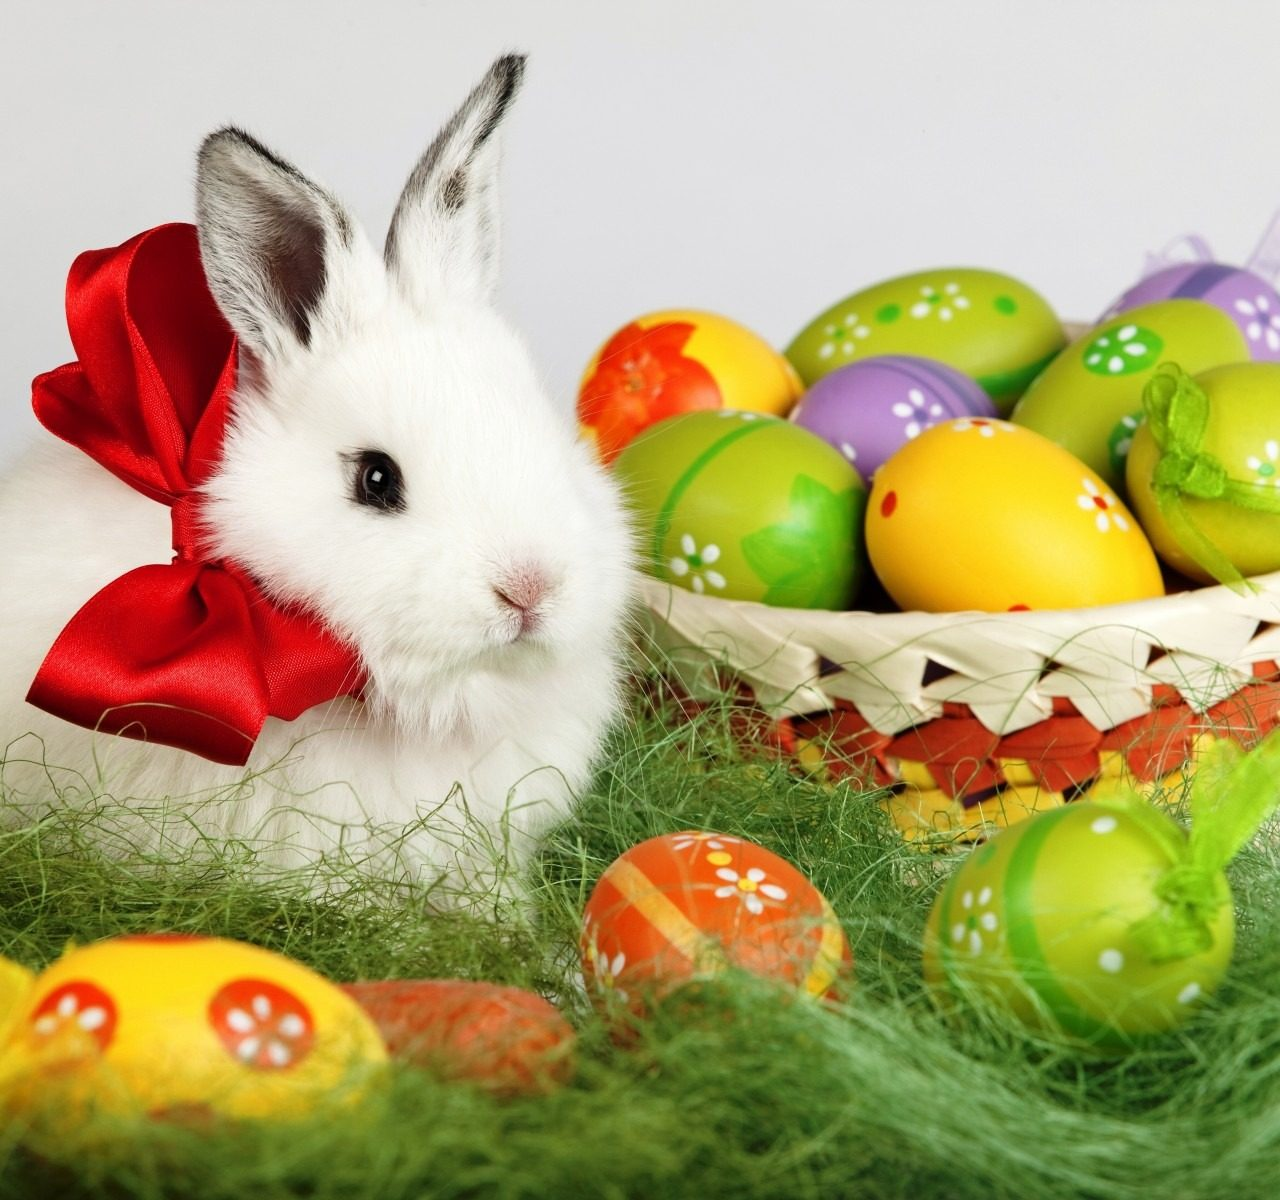 Easter Bunny Rabbit 4K Ultra Hd Pc Wallpaper   HD Wallpapers 1280x1200